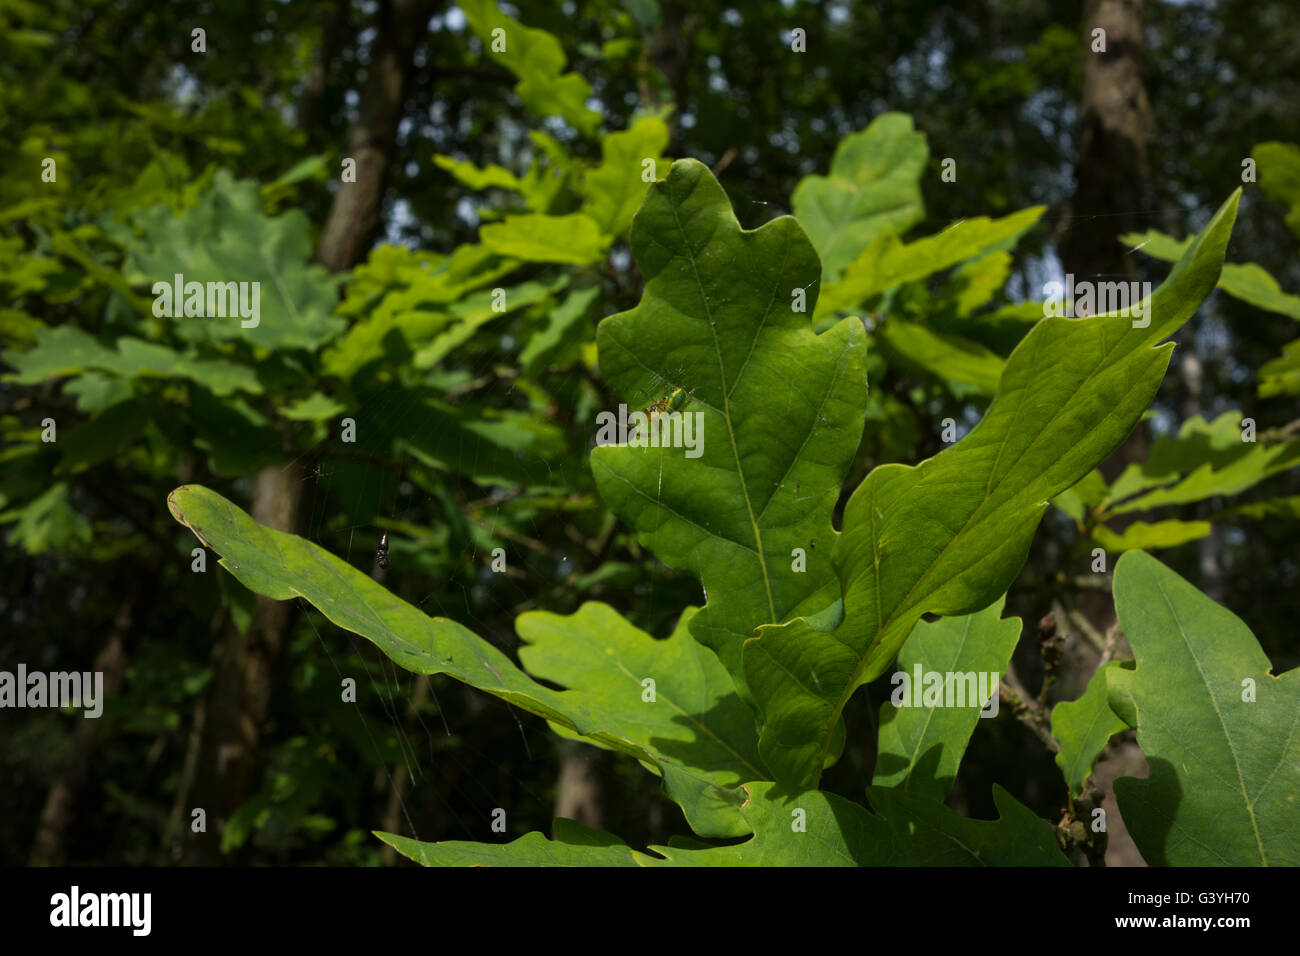 Cucumber green spider (Araniella cucurbitina) between leaves, Germany. - Stock Image